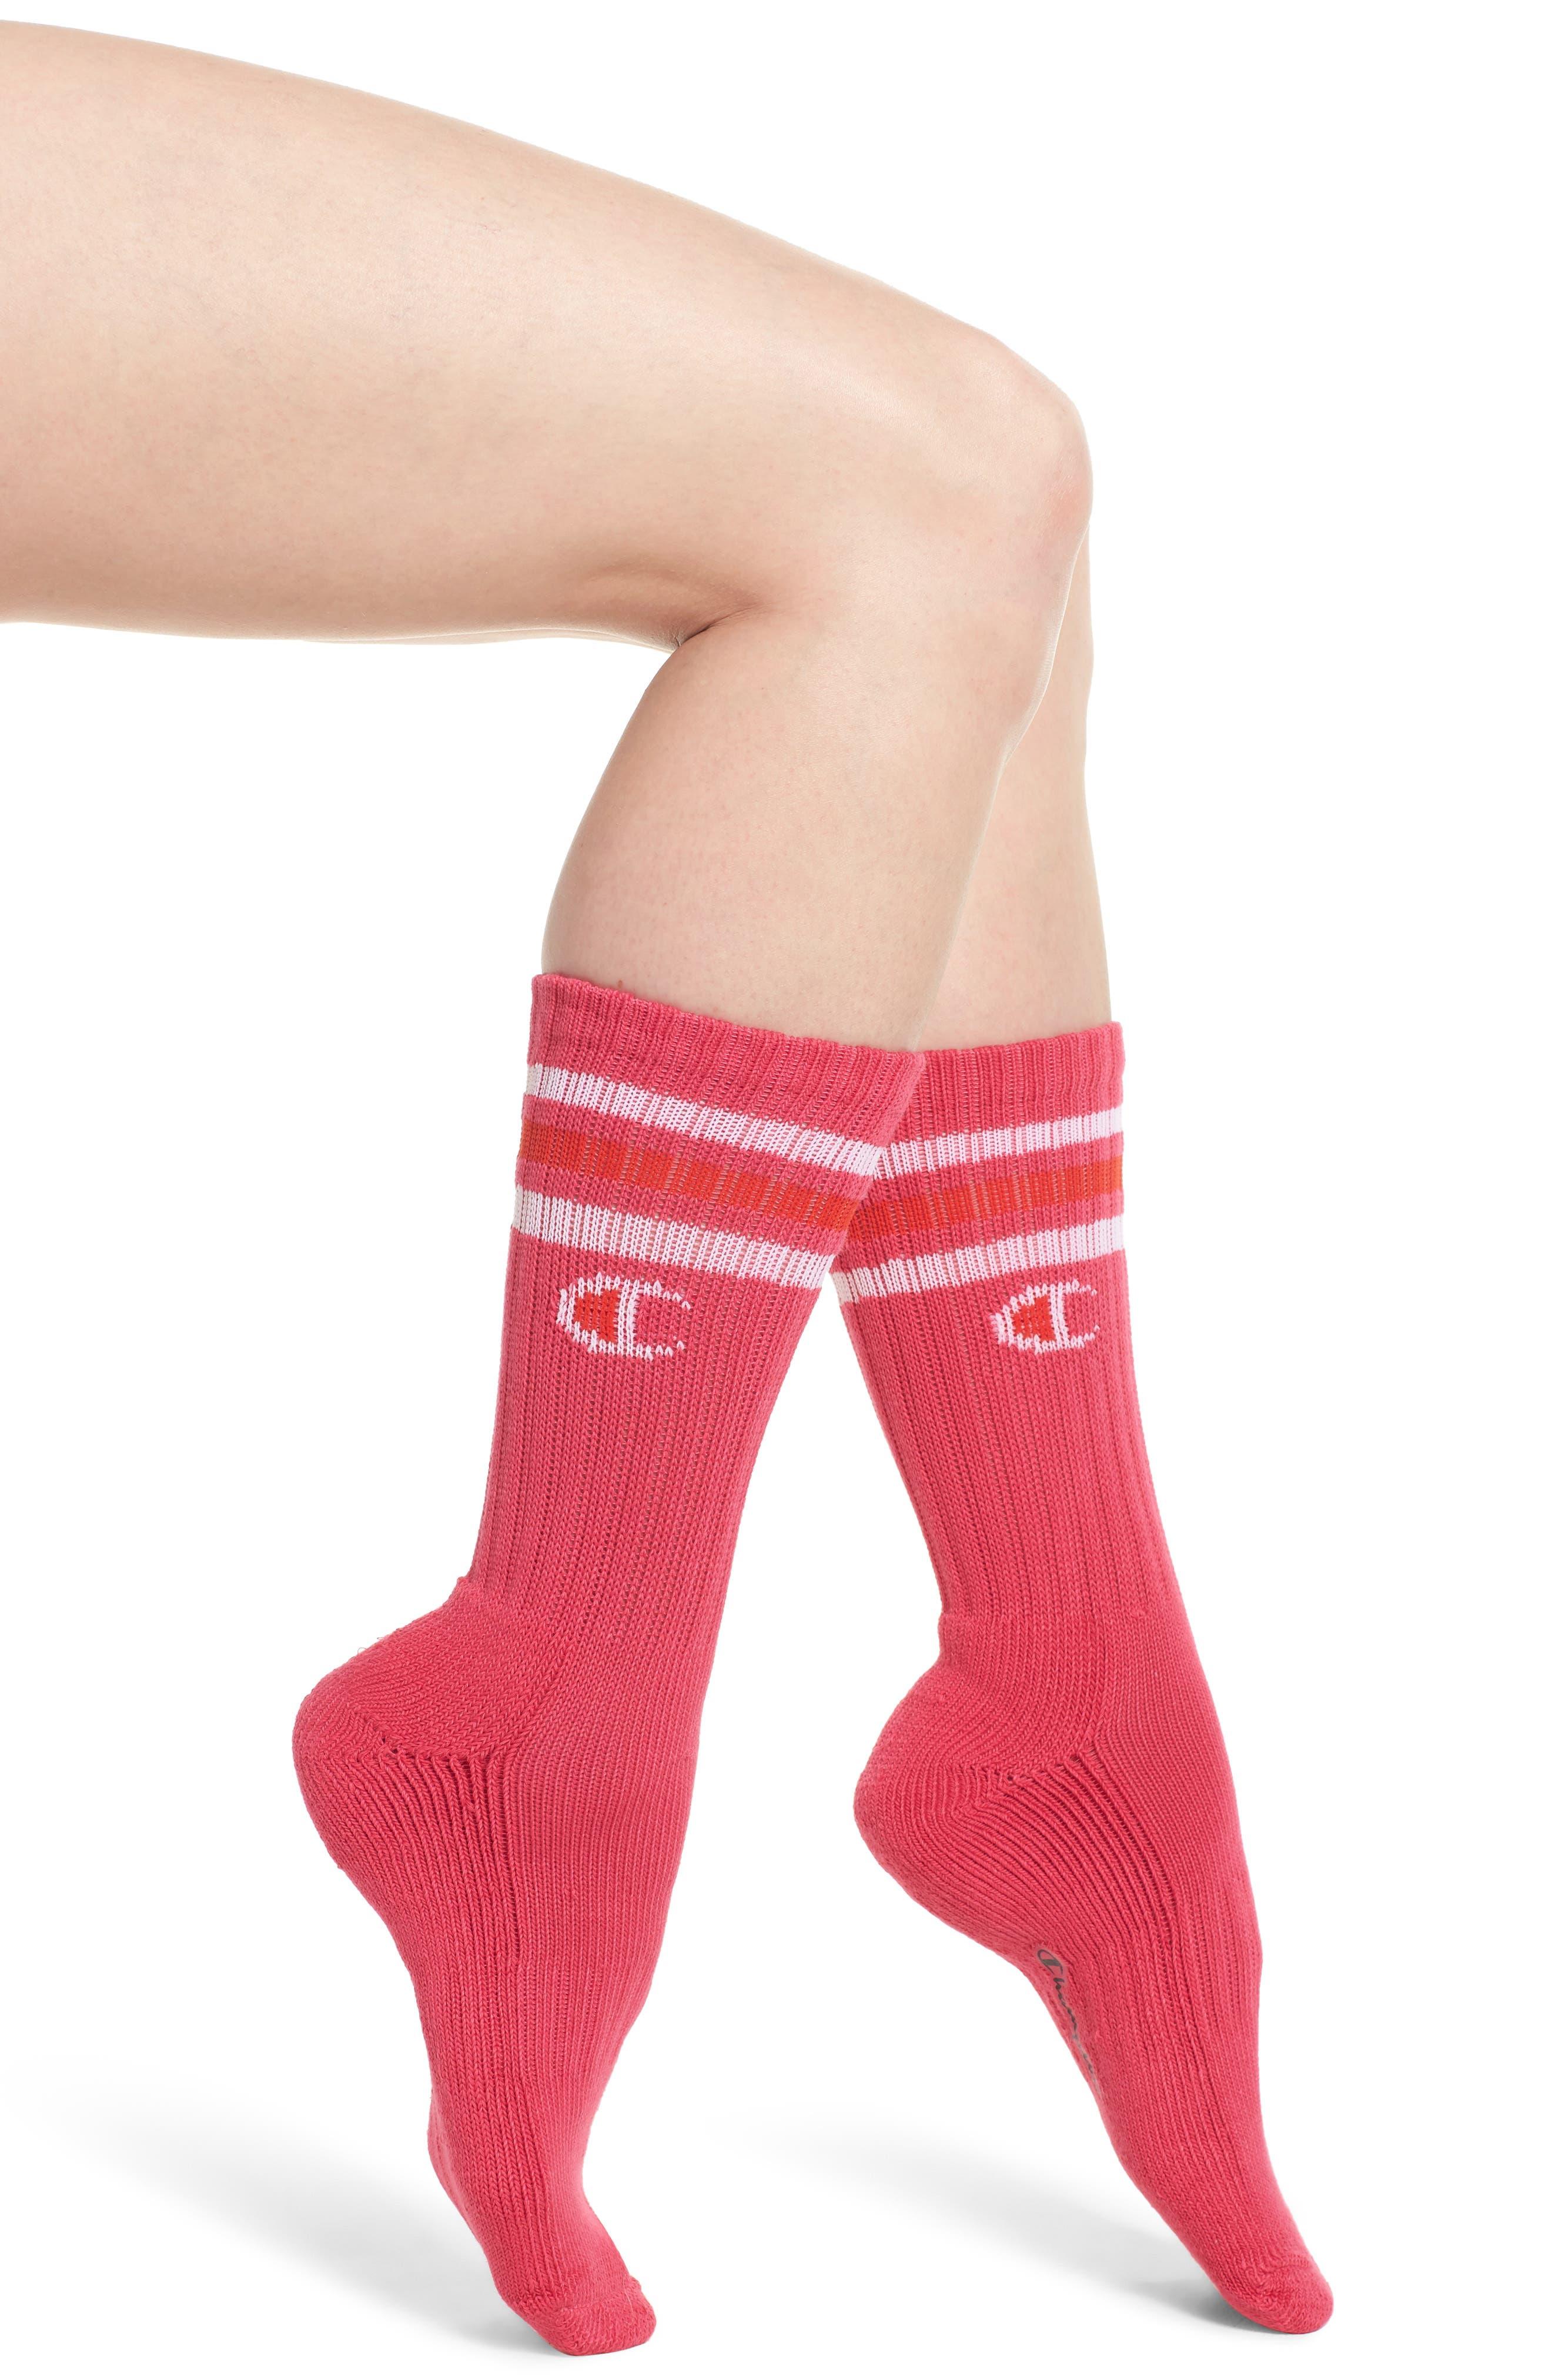 Big C Crew Socks,                             Main thumbnail 1, color,                             Pink